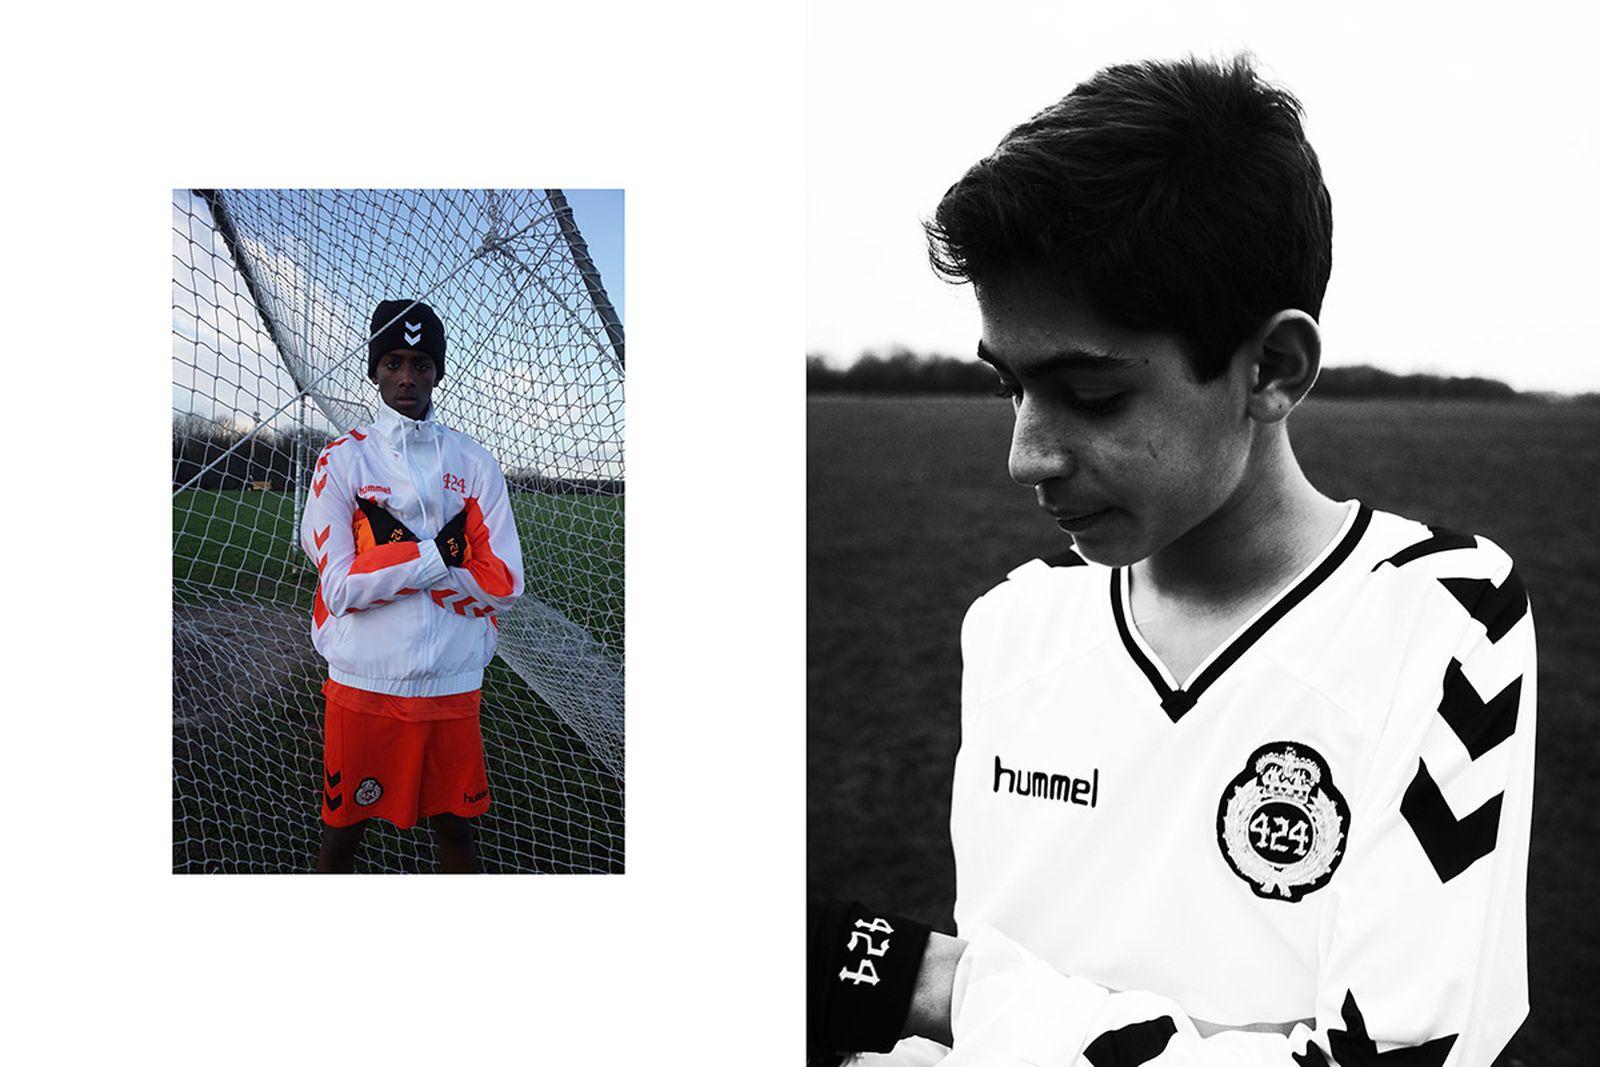 hummel-424-soccer-capsule-03